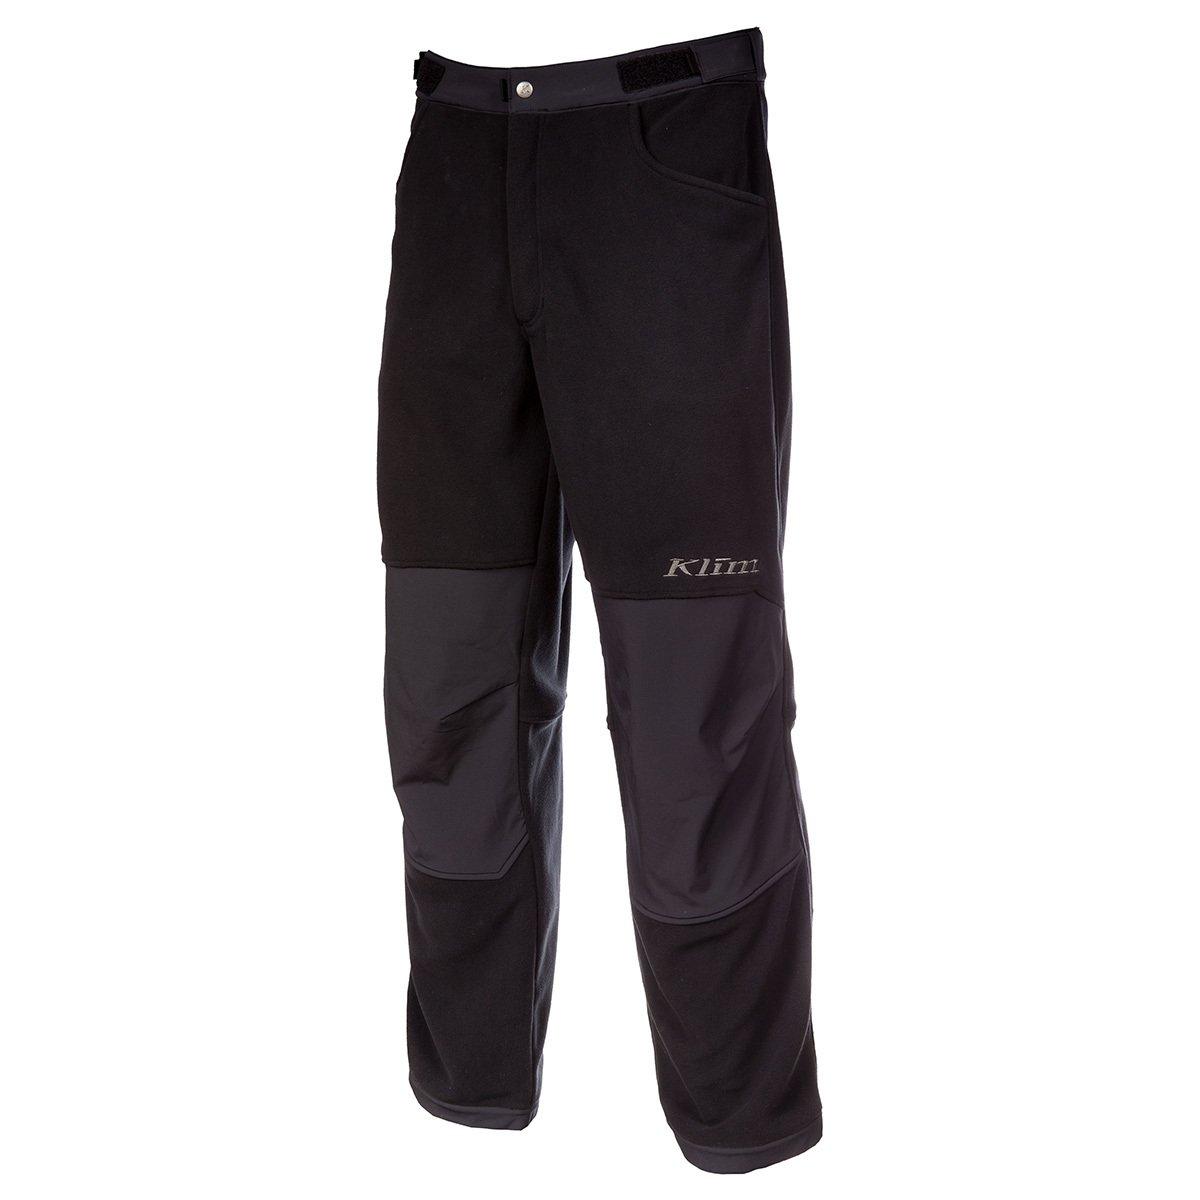 Klim Everest Pant - Medium/Black